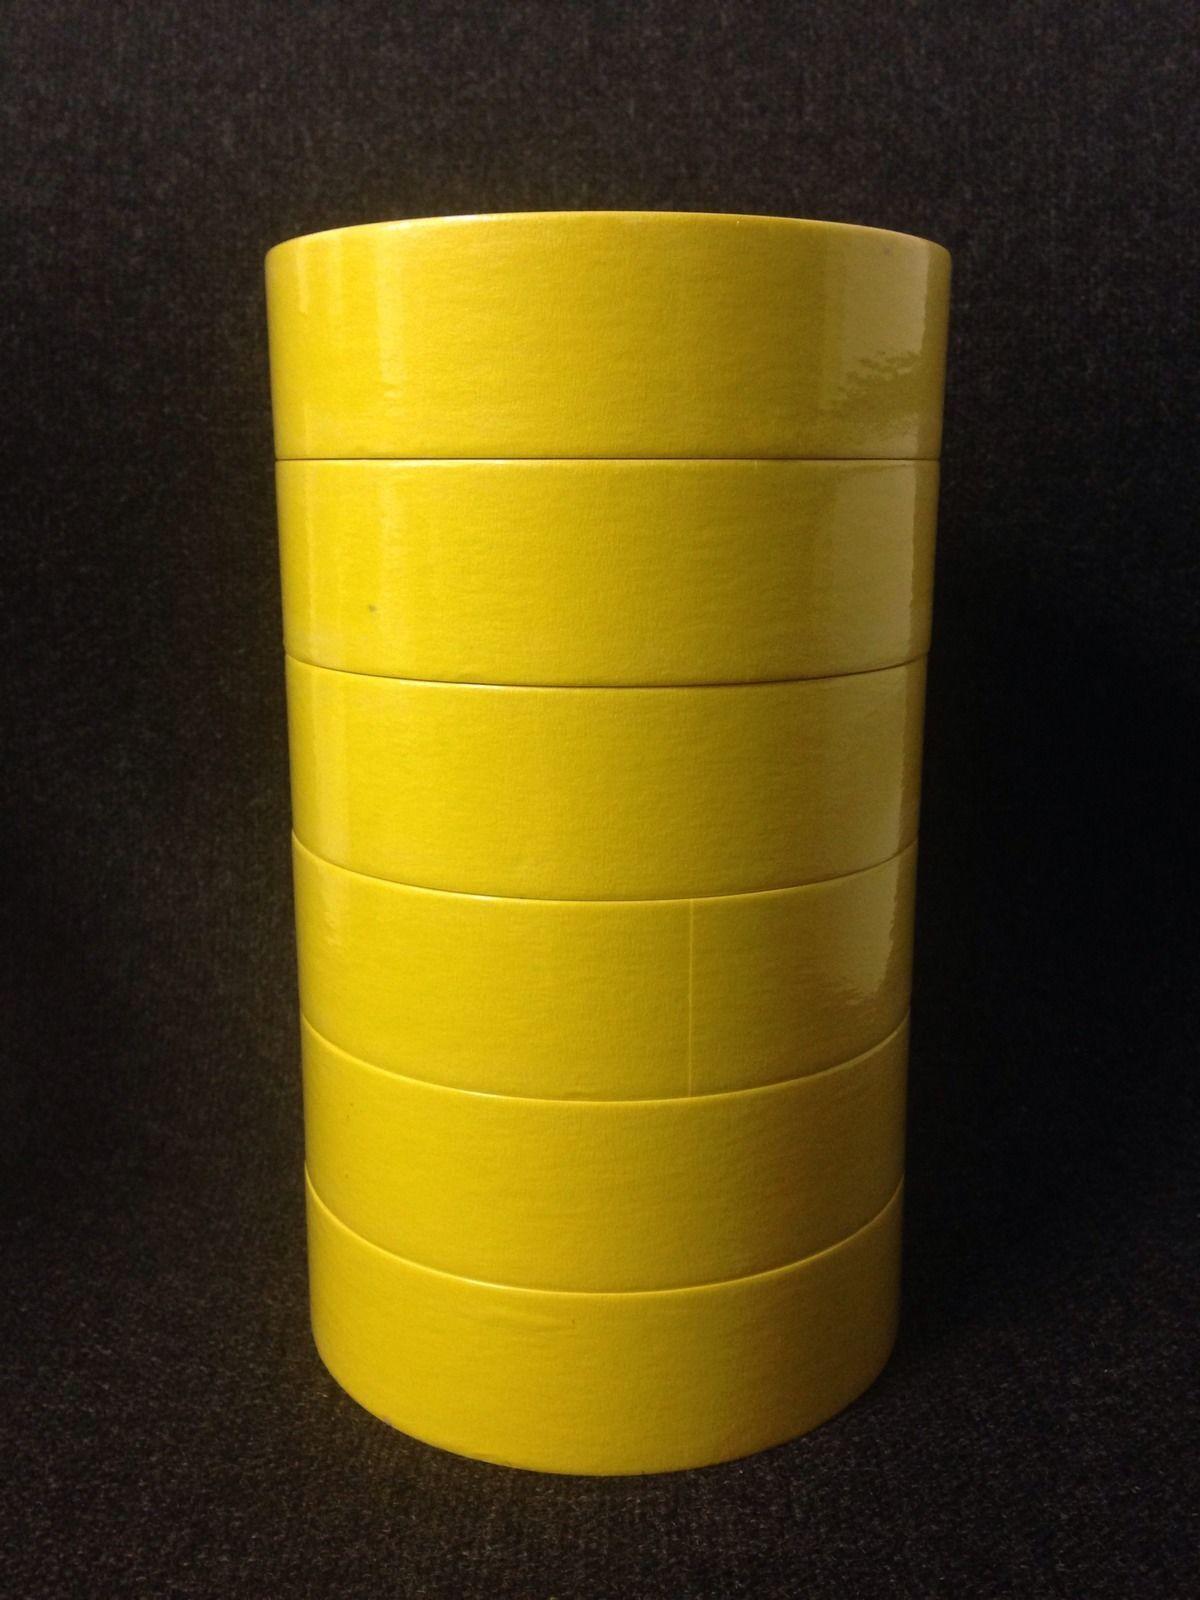 06654 masking tape 1 5 yellow 6